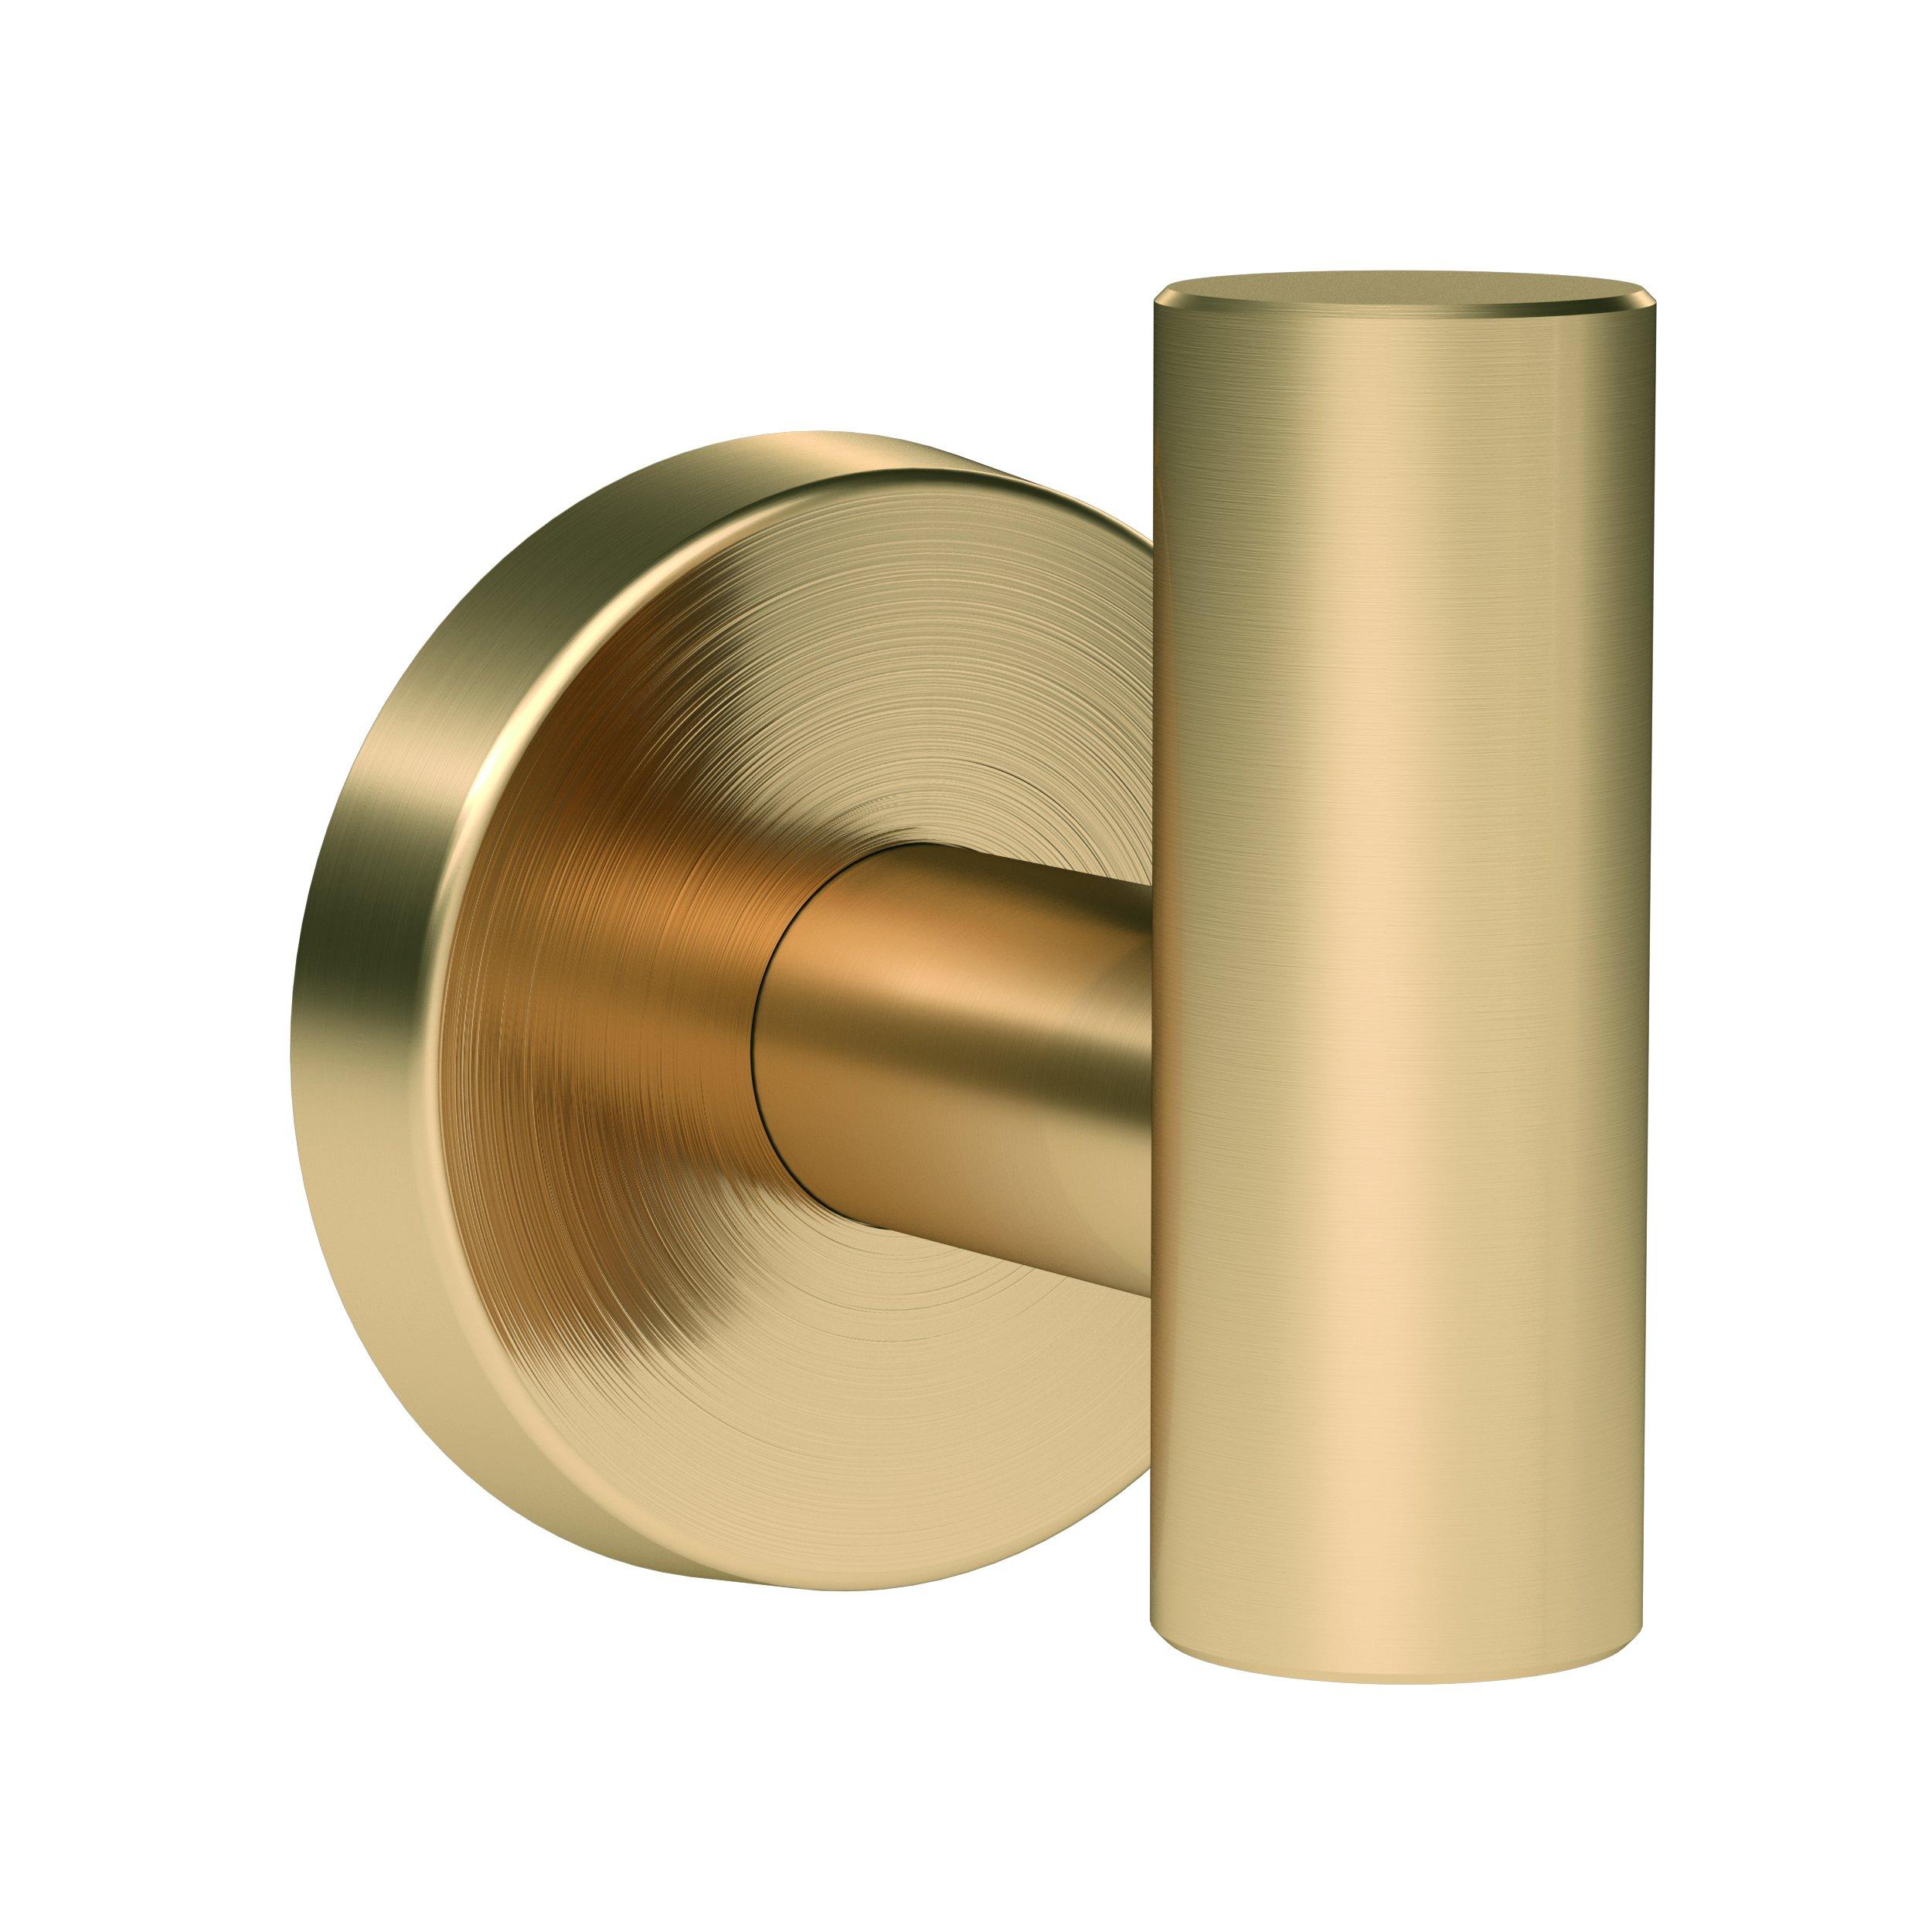 Amerock BH26542BBZ Arrondi Single Robe Hook in Brushed Bronze/Golden Champagne